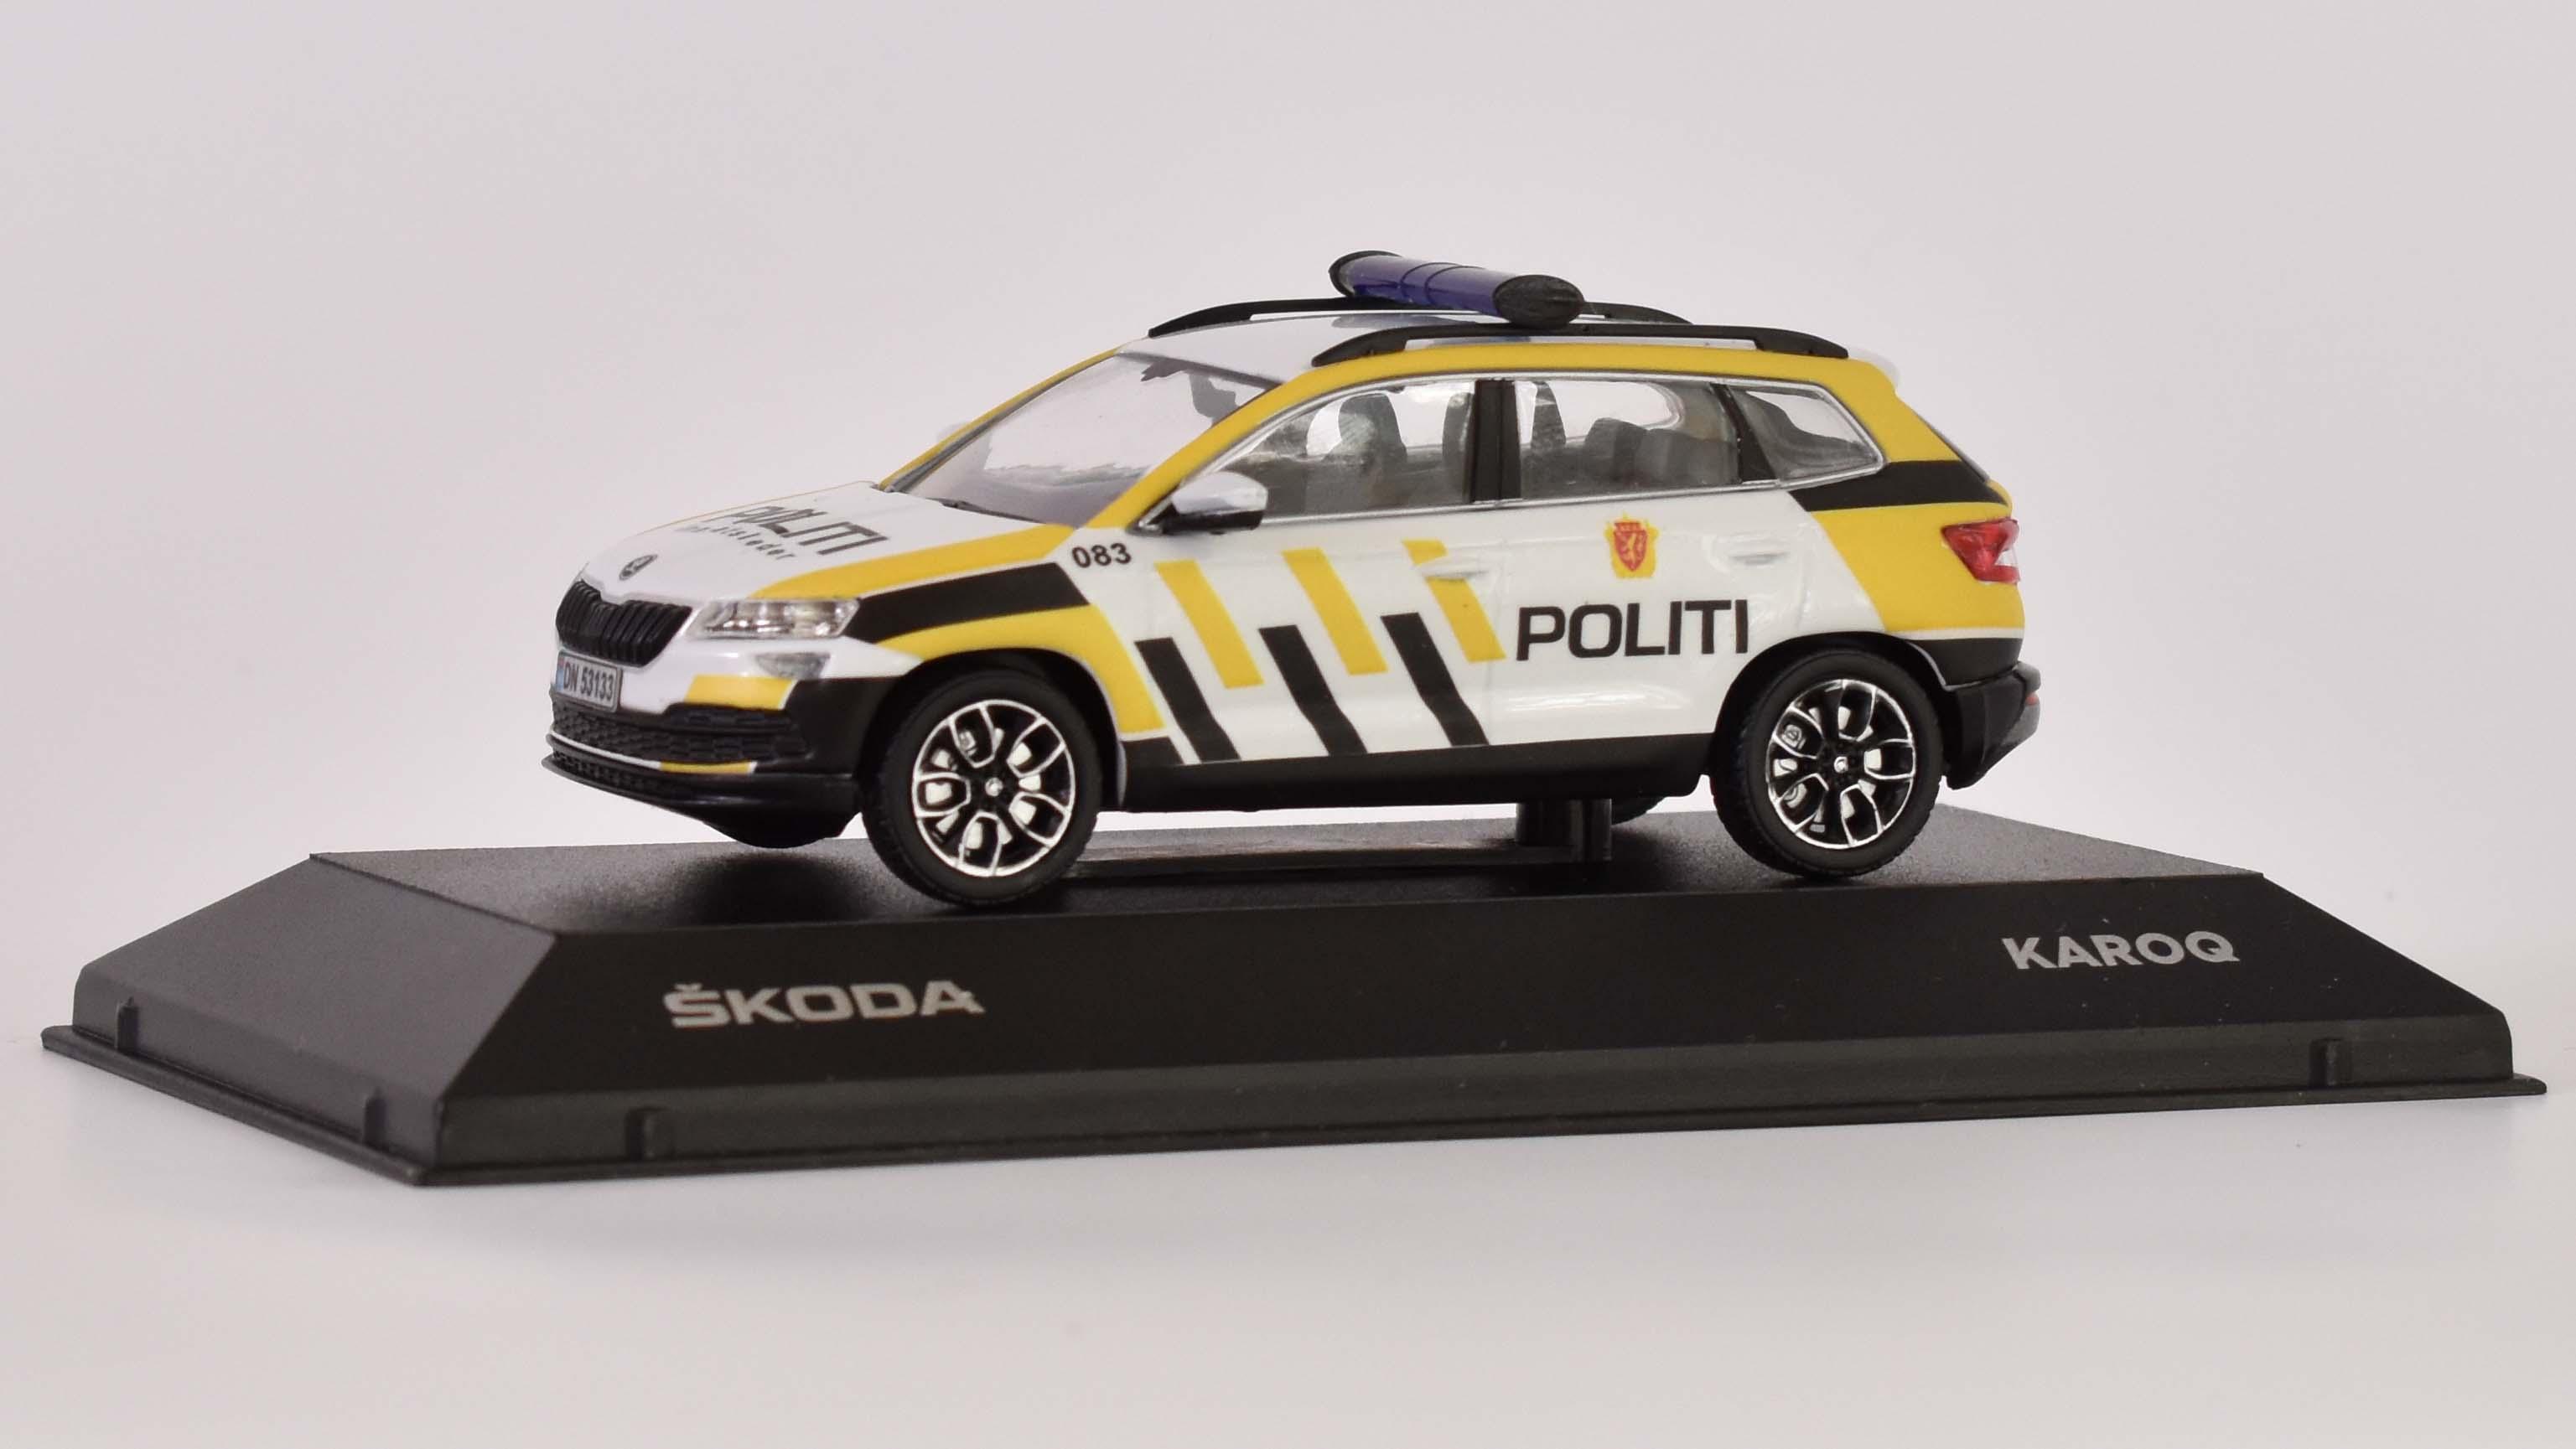 962fa5f991ac0 Škoda Karoq - Policie Norsko 1:43 časopis AutoModels s modelem